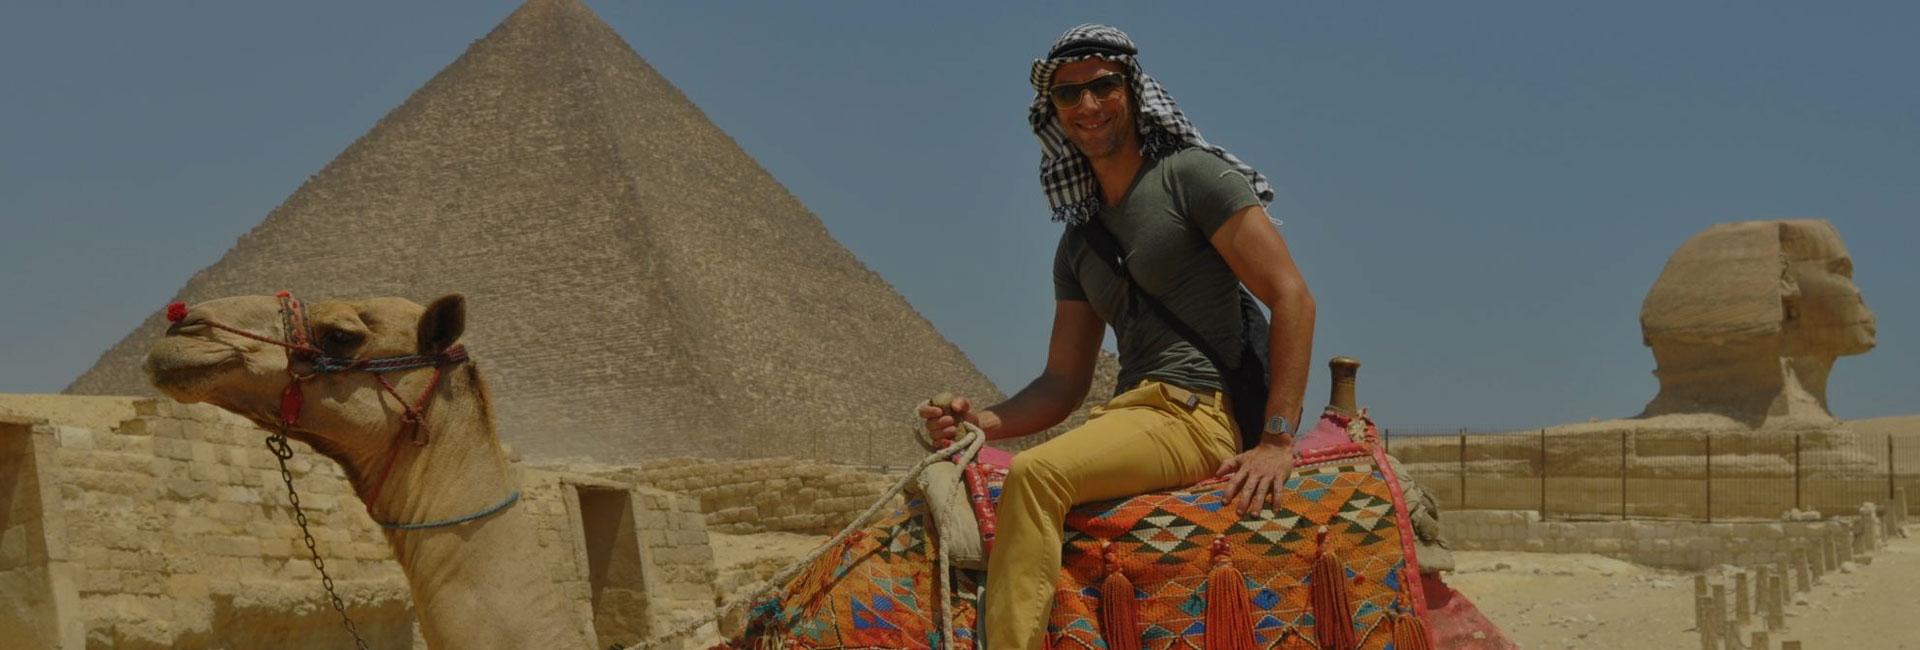 Cairo Tour by Flight